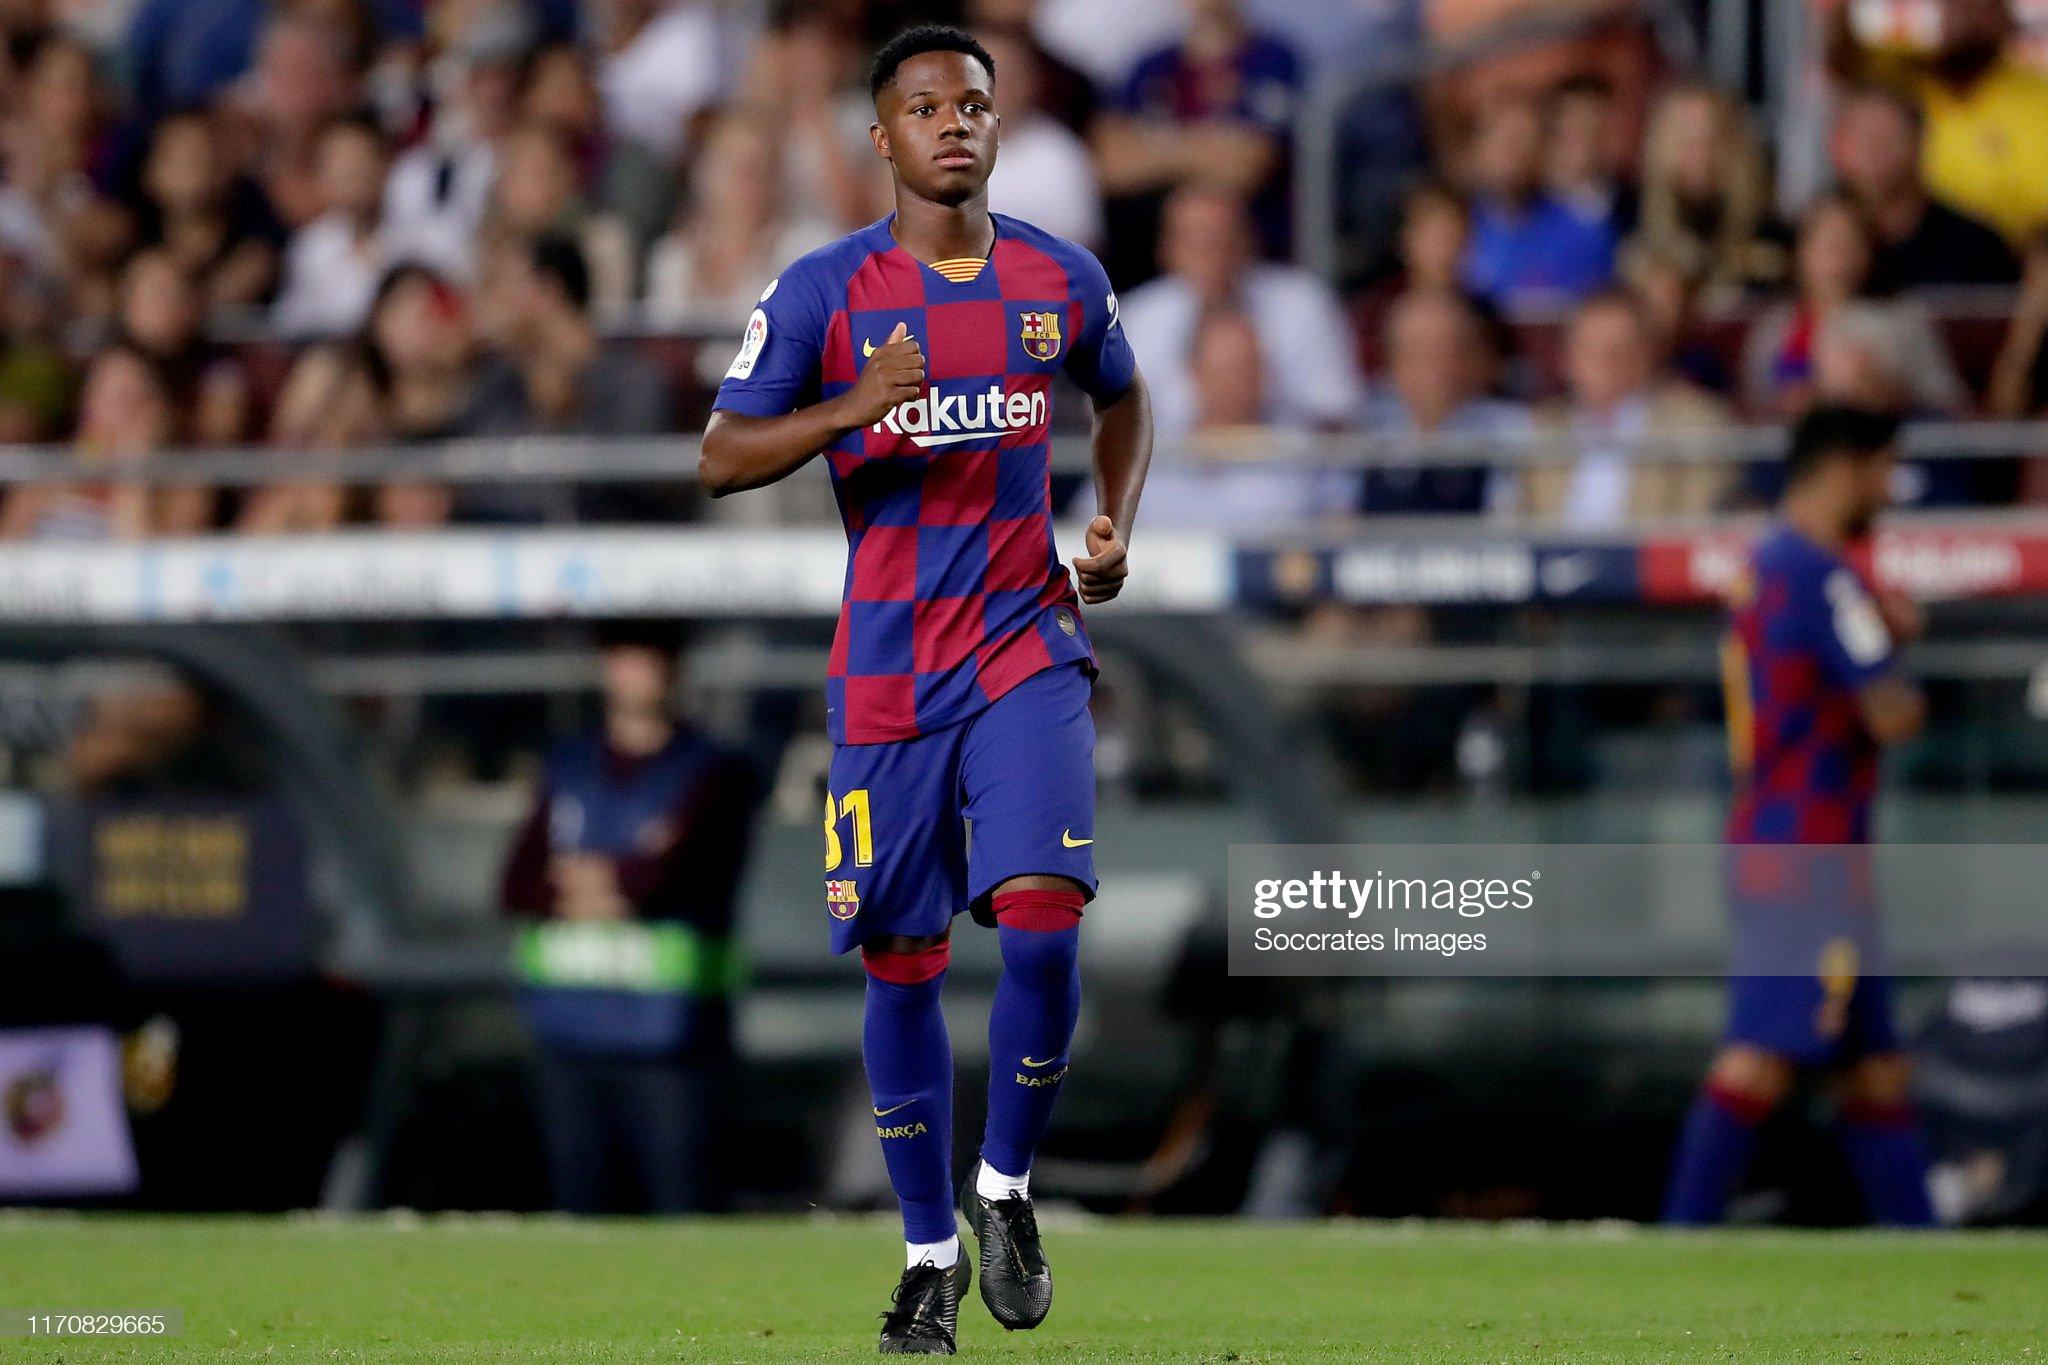 صور مباراة : برشلونة - فياريال 2-1 ( 24-09-2019 )  Ansu-fati-of-fc-barcelona-during-the-la-liga-santander-match-between-picture-id1170829665?s=2048x2048